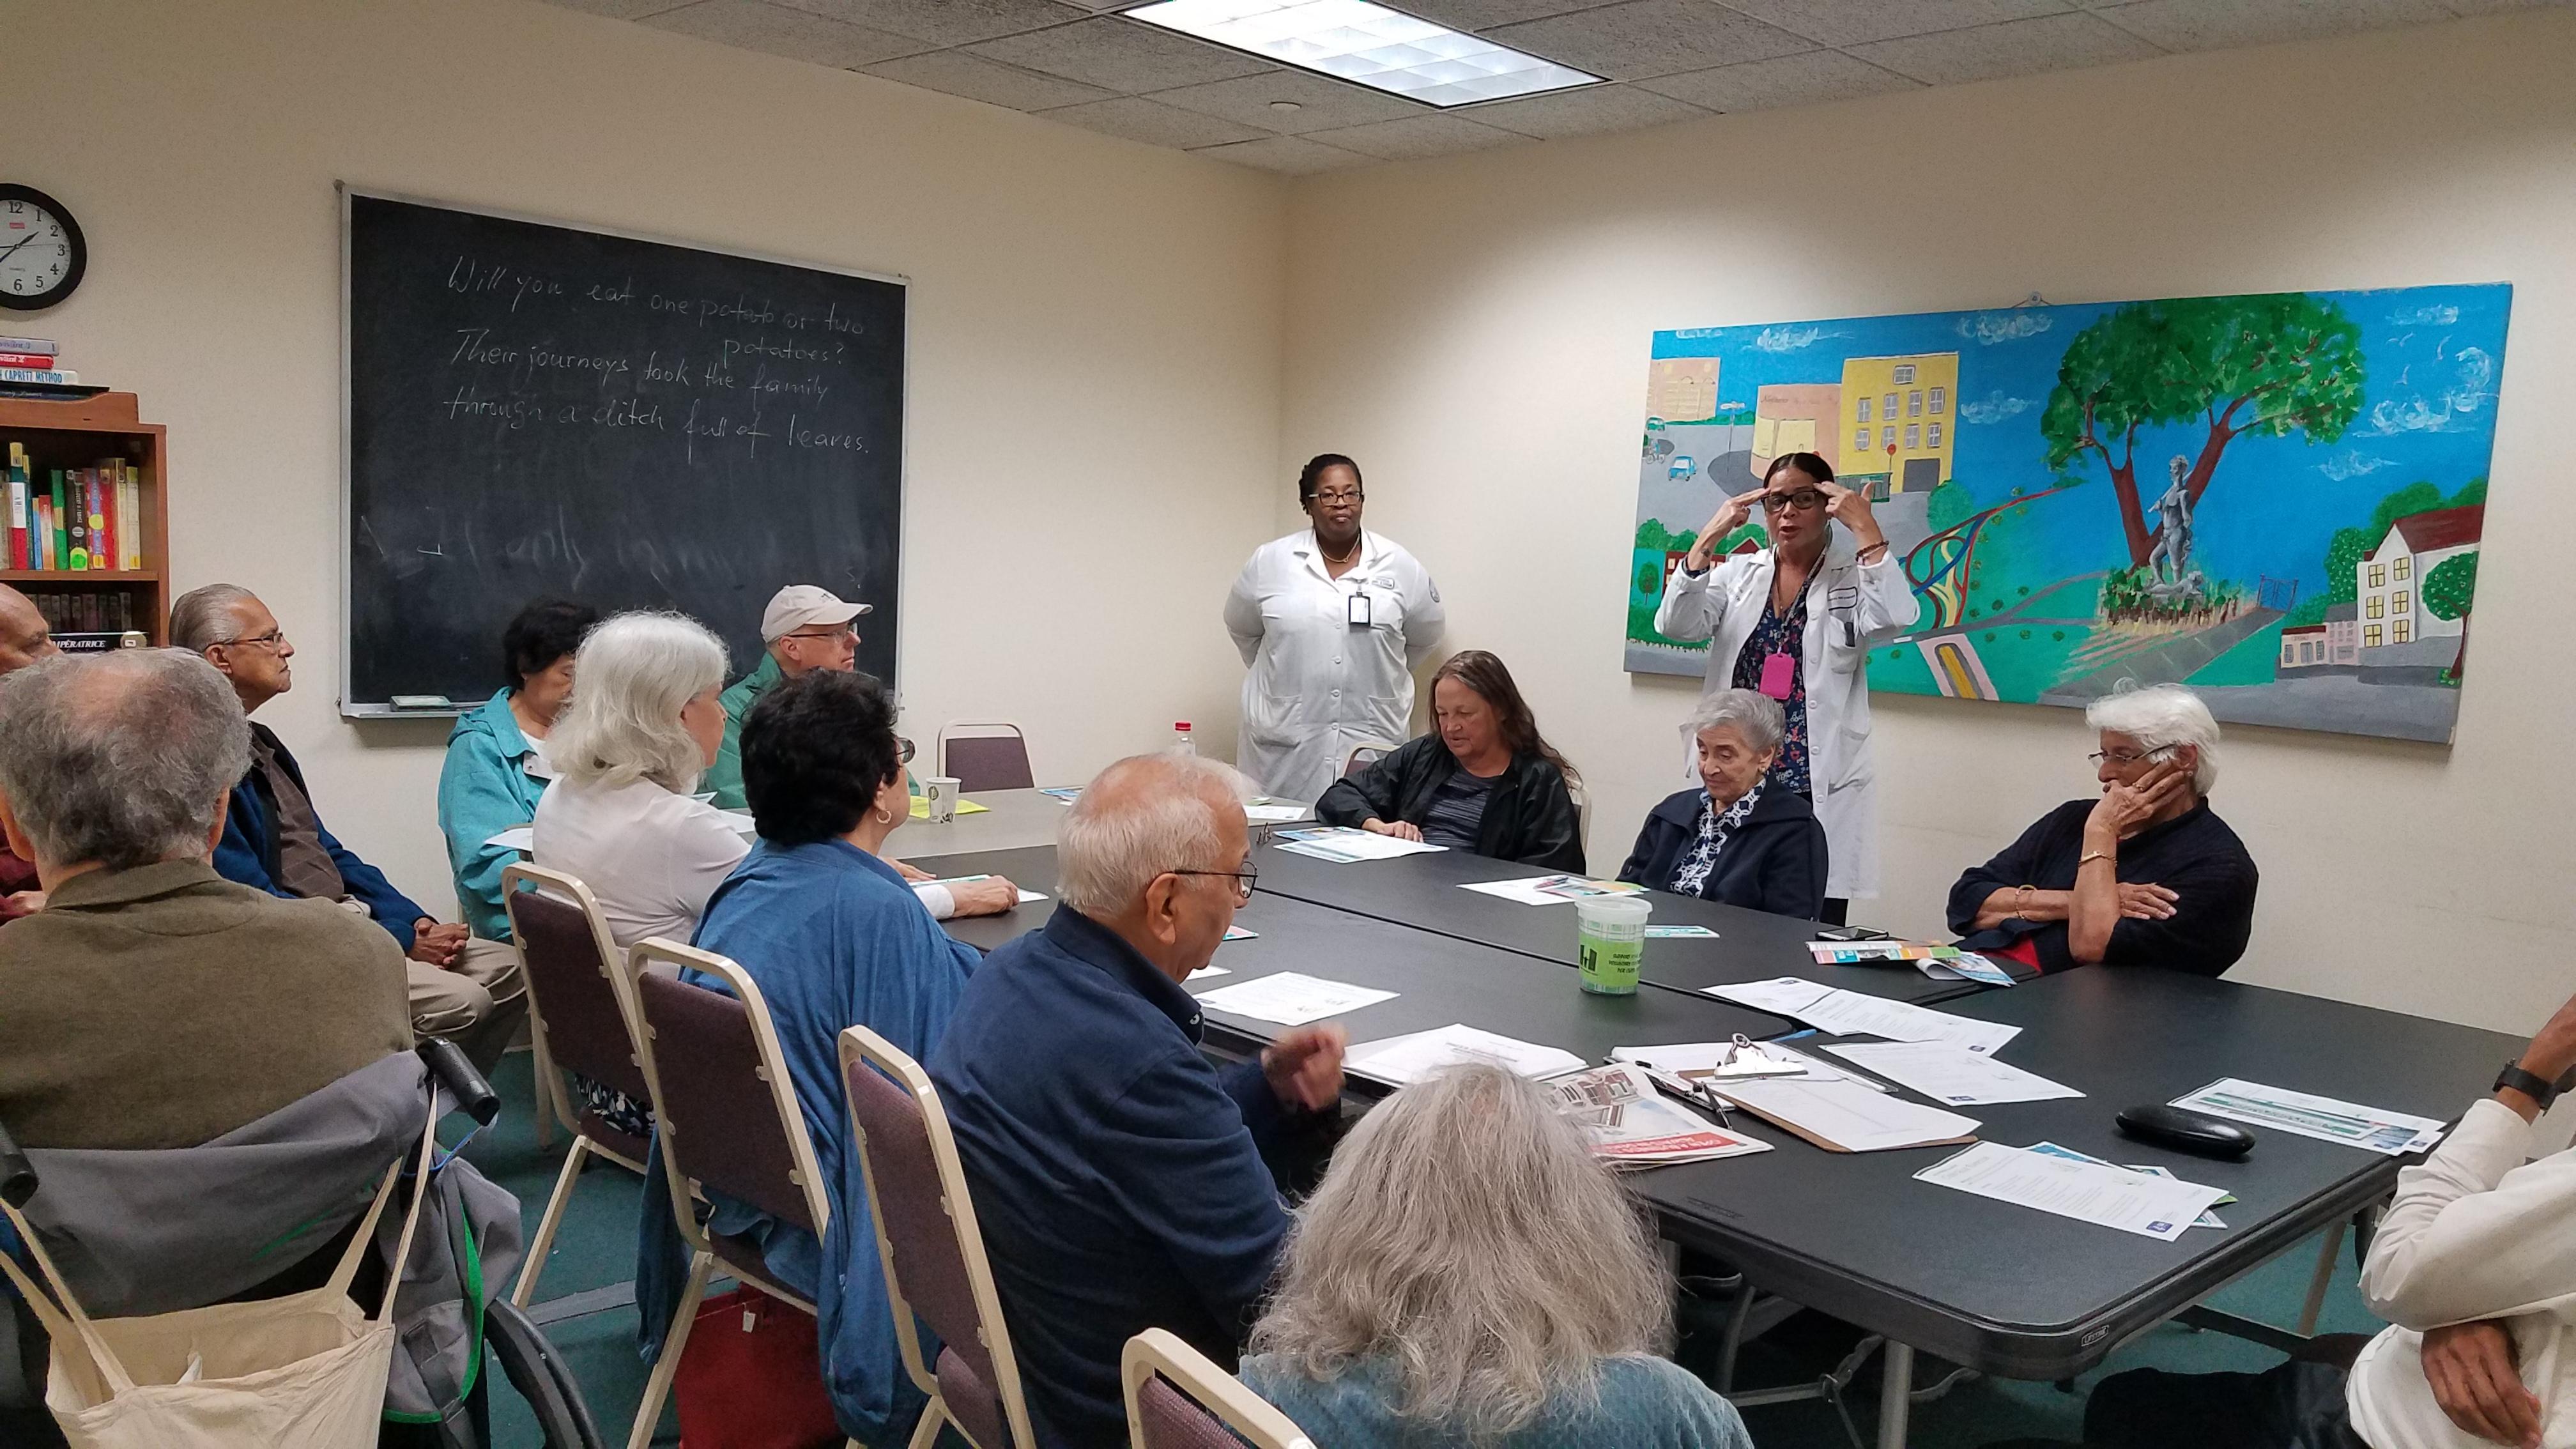 Kew gardens community center falls prevention workshop - Doctors medical center miami gardens ...